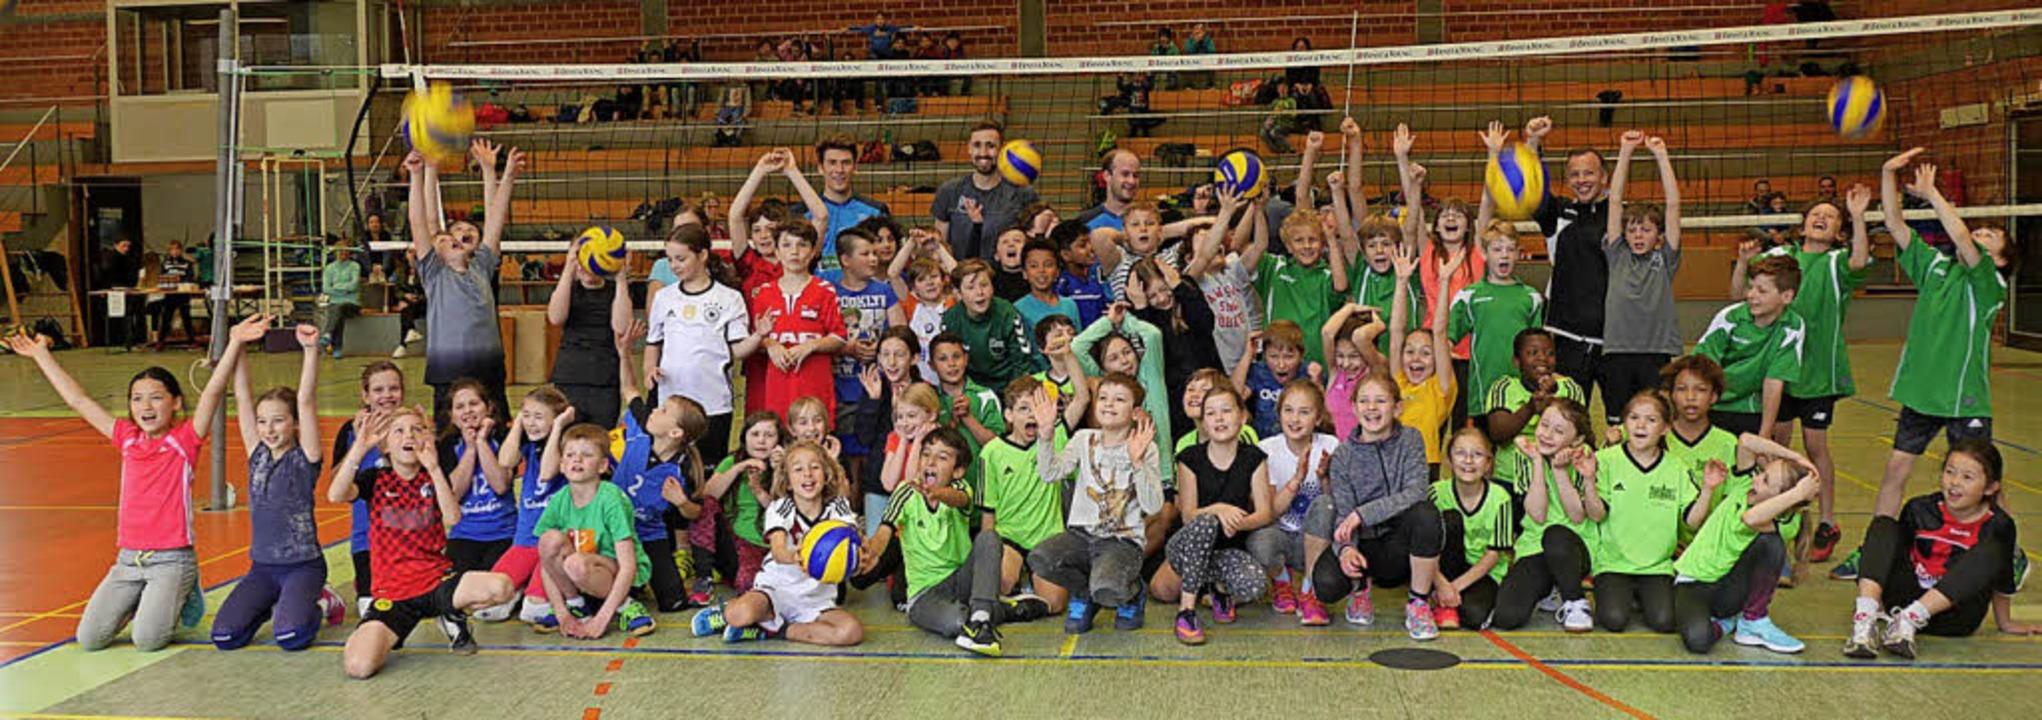 <BZ-FotoAnlauf>Volleyball </BZ-FotoAnl...0 Grundschüler, am besten die Feyels.   | Foto: Mack